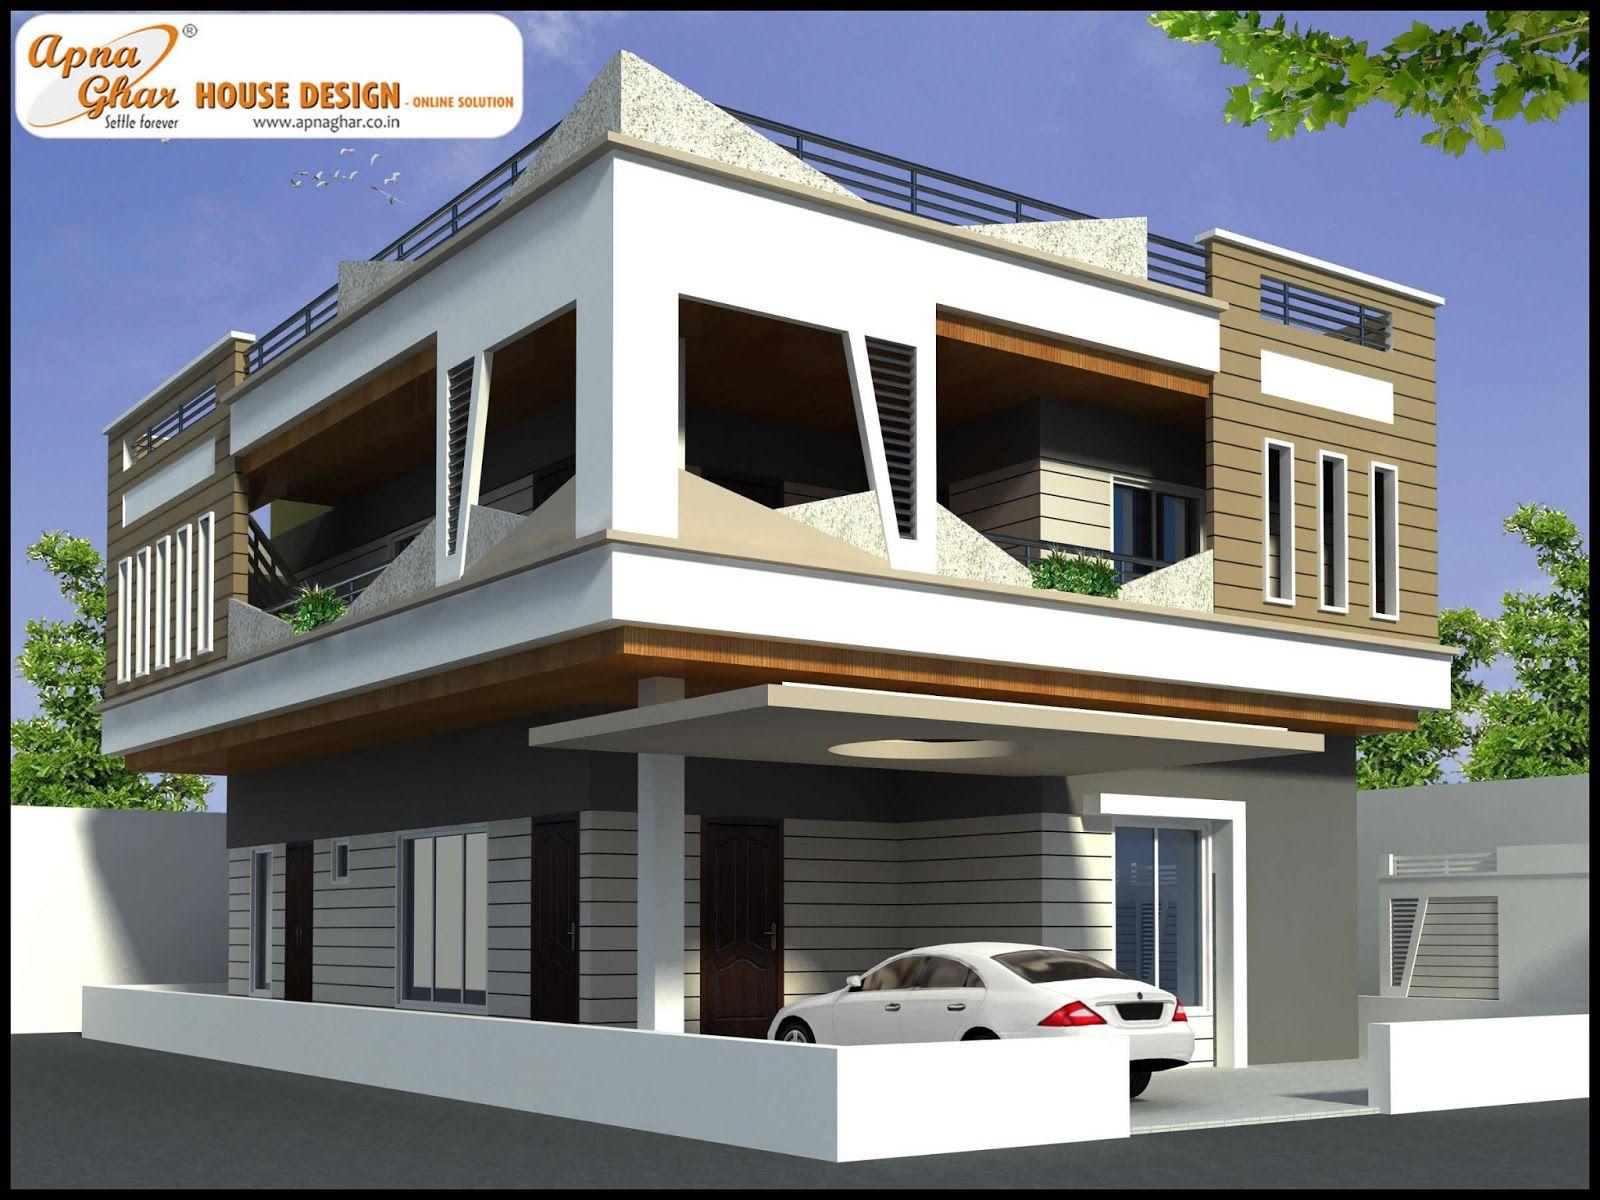 3 Bedroom Modern House Design Duplex House Design  Apnaghar House Design  Page 3  House